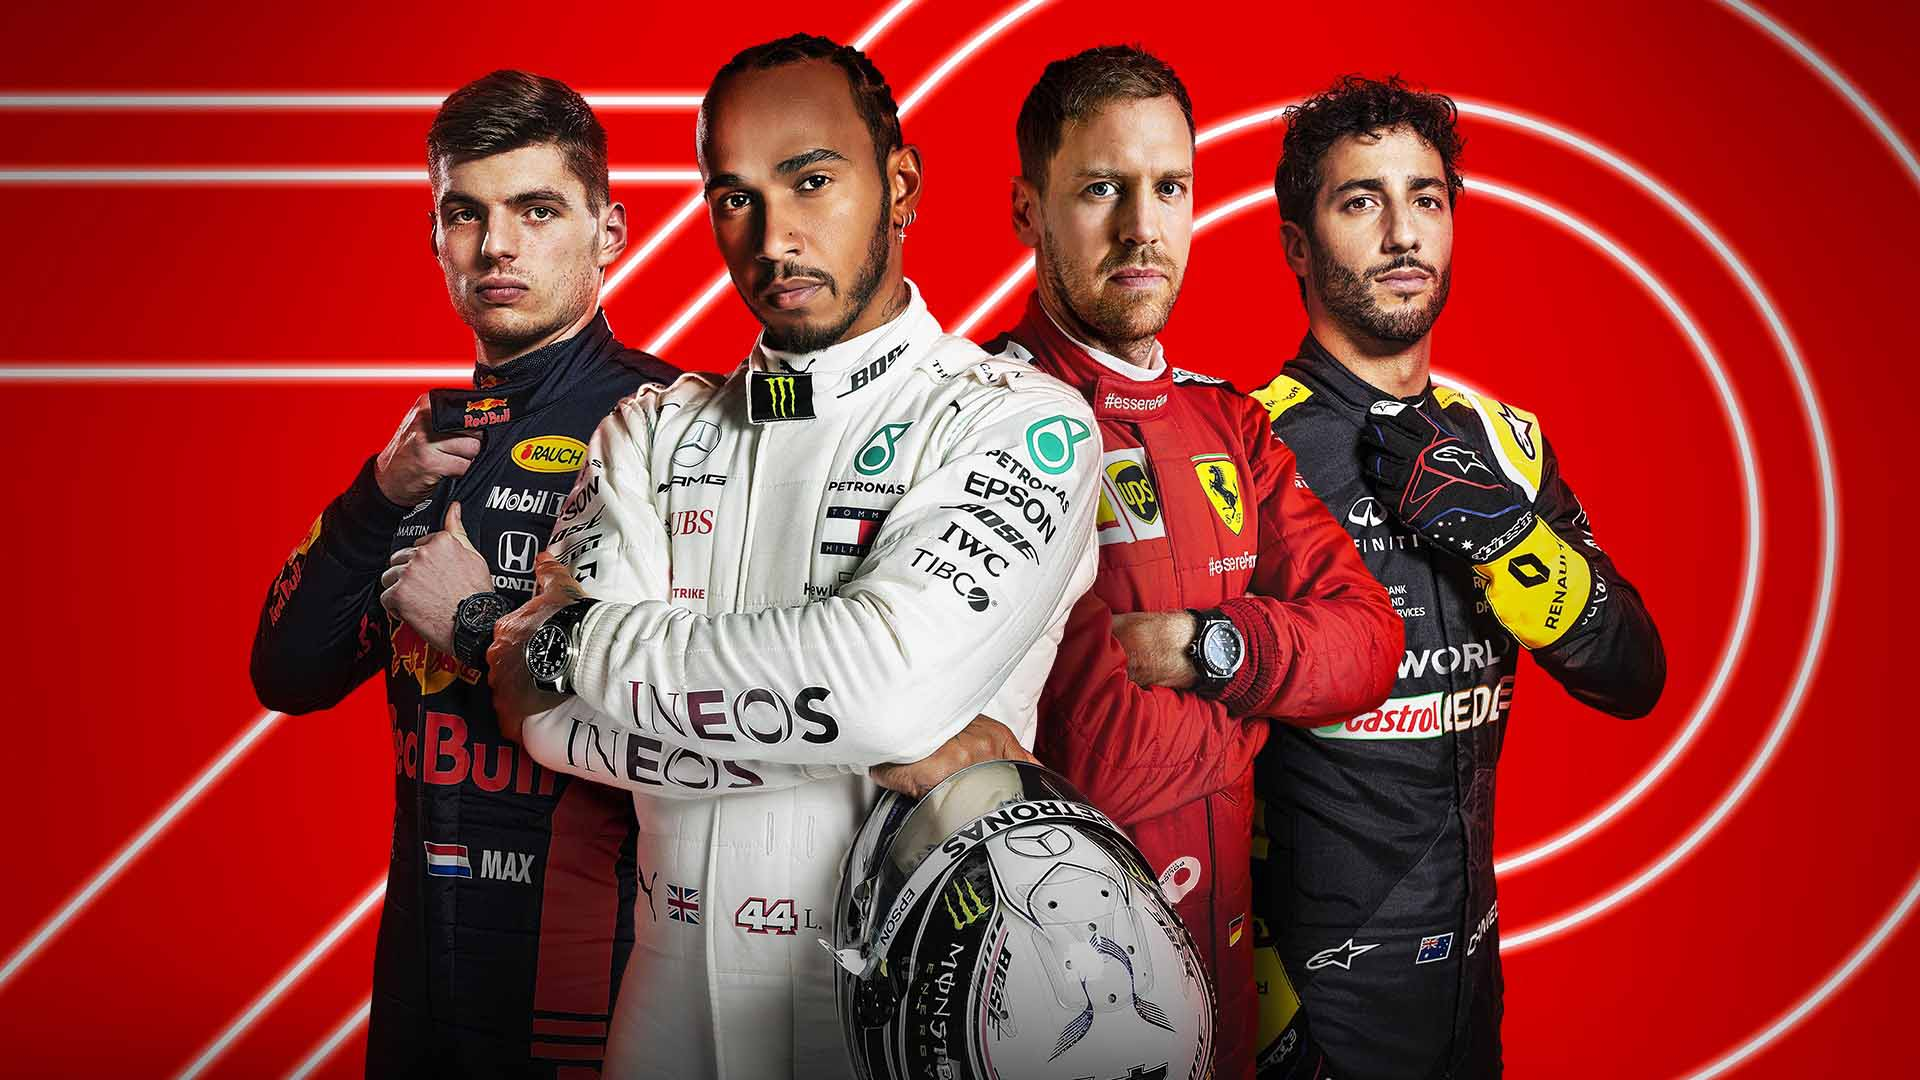 Análisis de F1 2020 - Xbox One 1